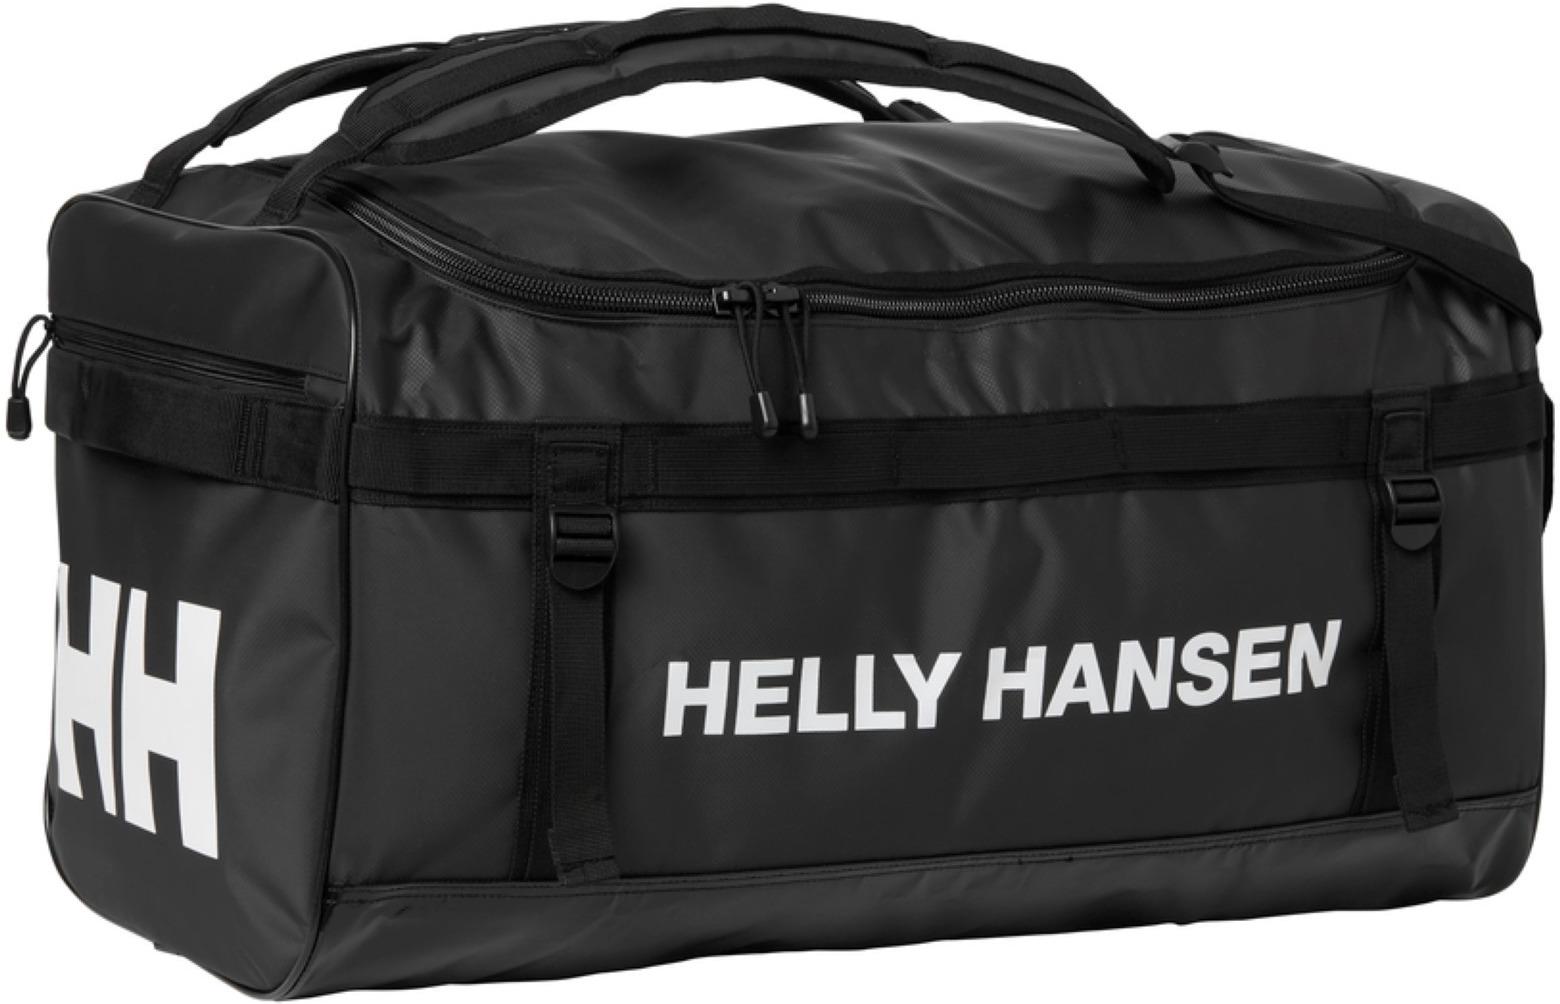 цена на Сумка Helly Hansen Hh Classic Duffel Bag, 67168_990, черный